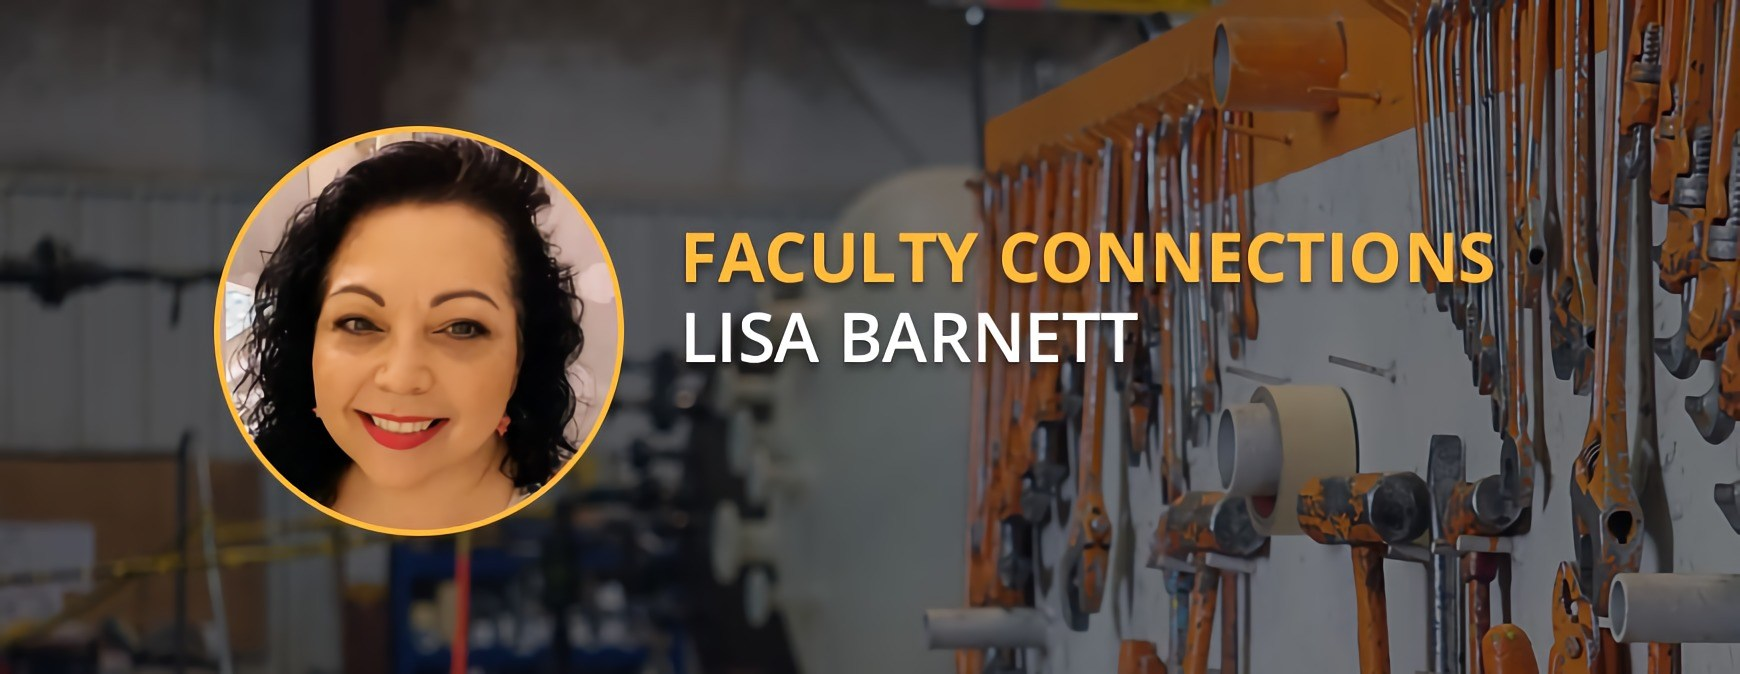 Lisa Barnett Staff Connection